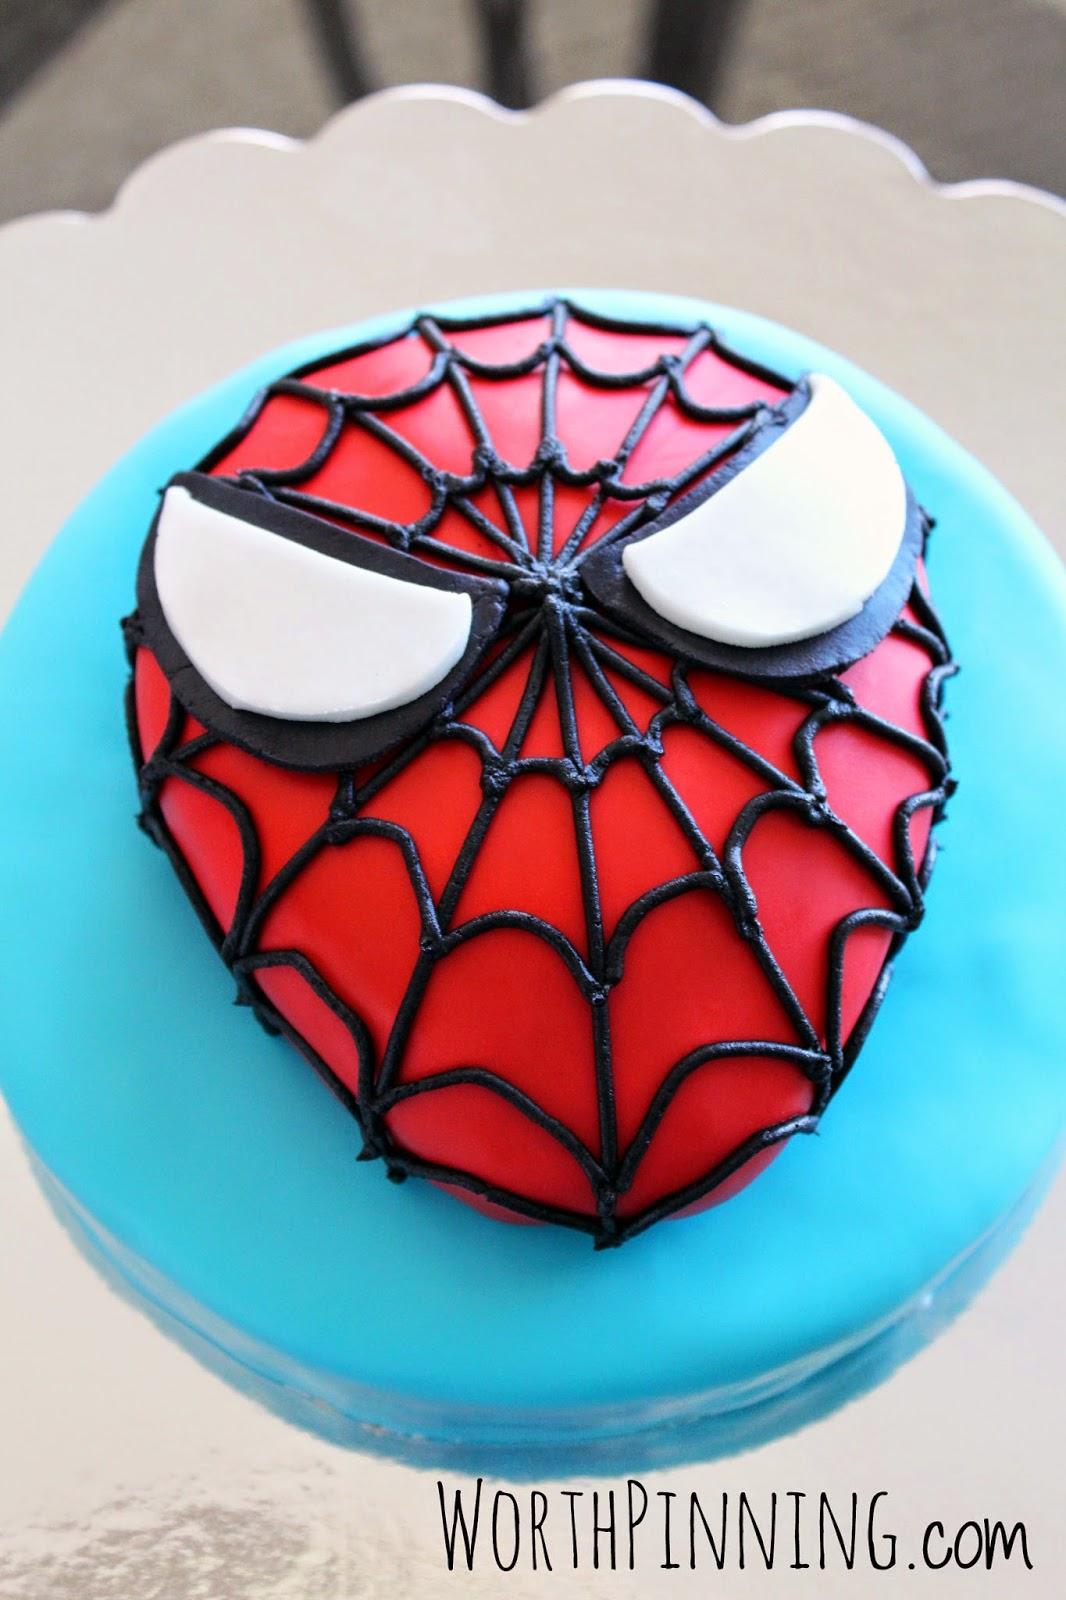 Spider Birthday Cake Images